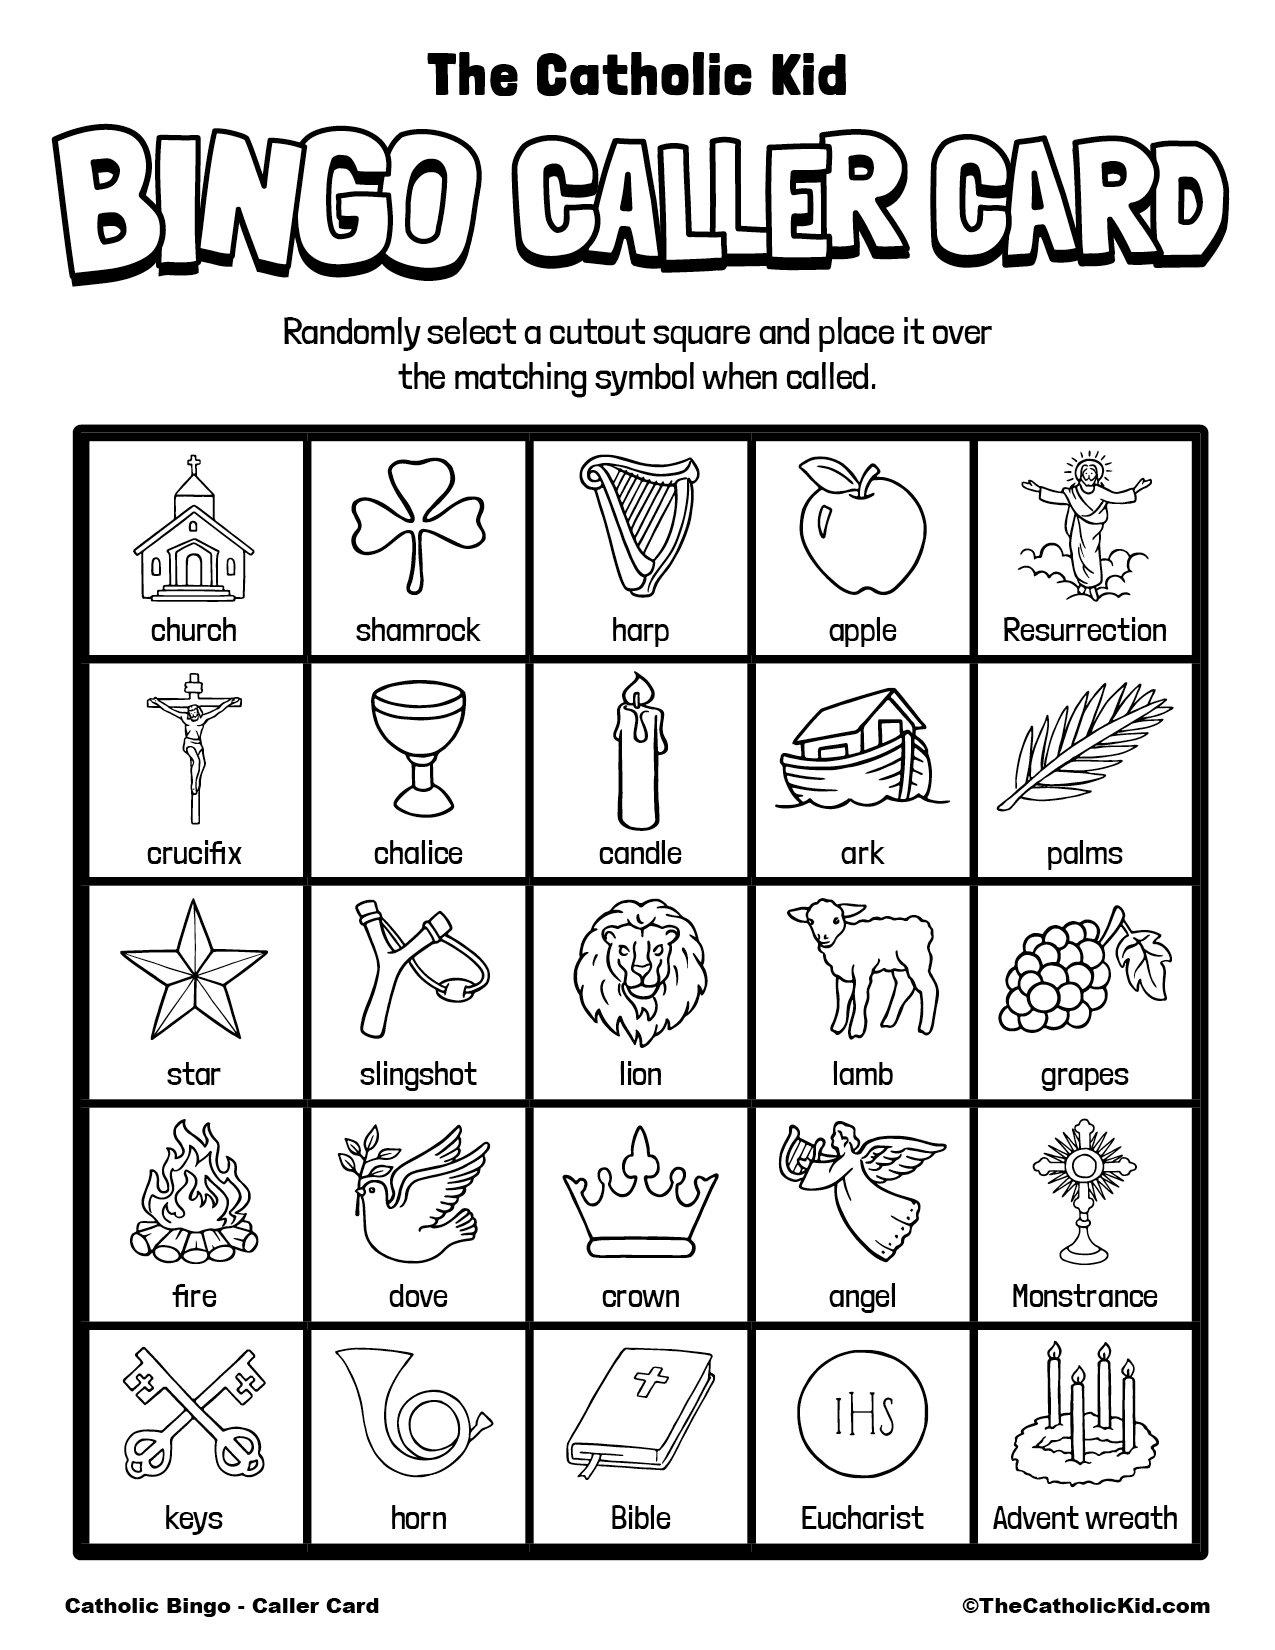 Free Printable Catholic Bingo Game Caller Card